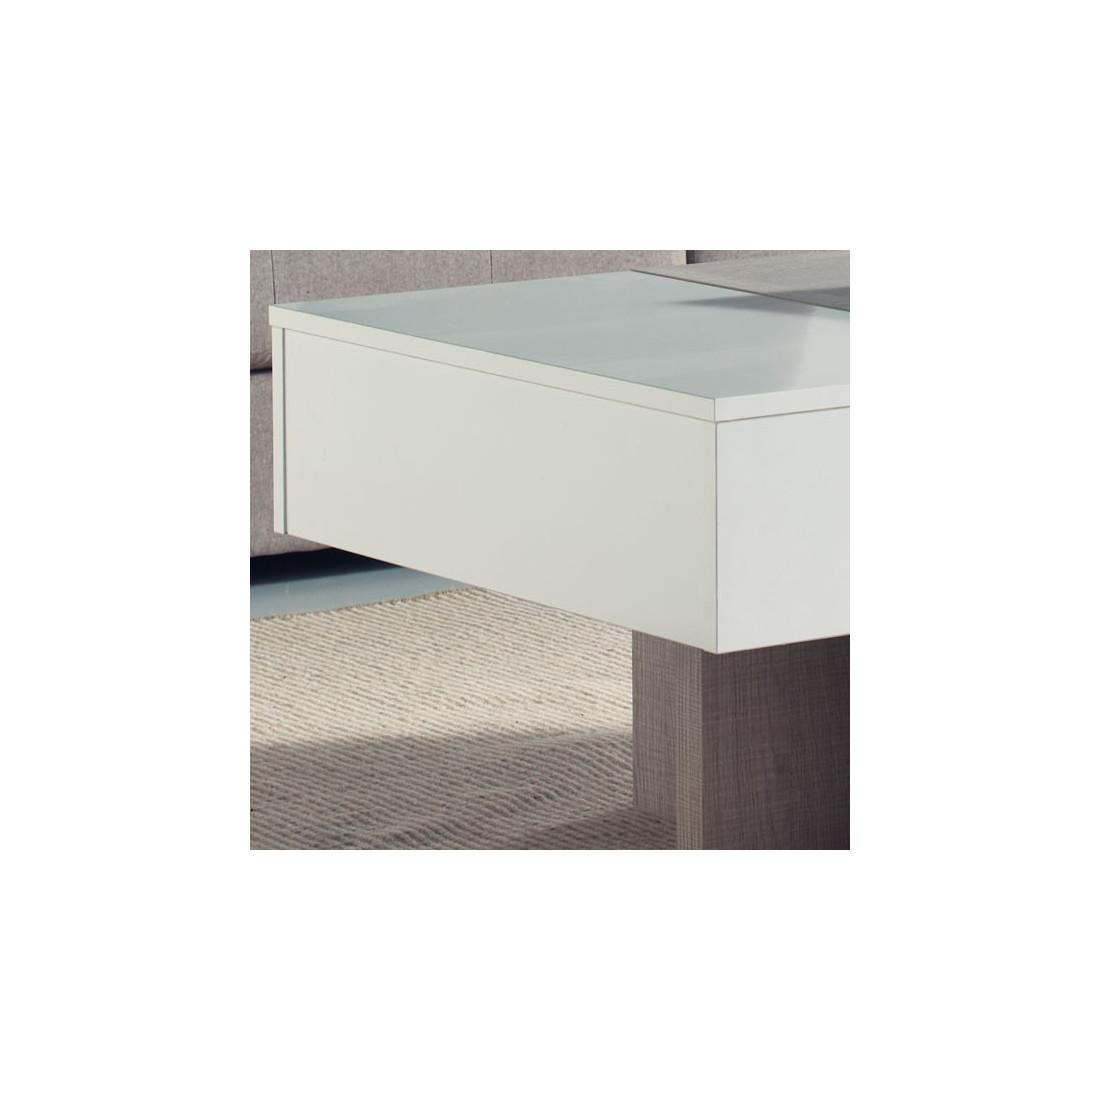 Table basse relevable blanc ch ne clair ajar salon for Table basse ch